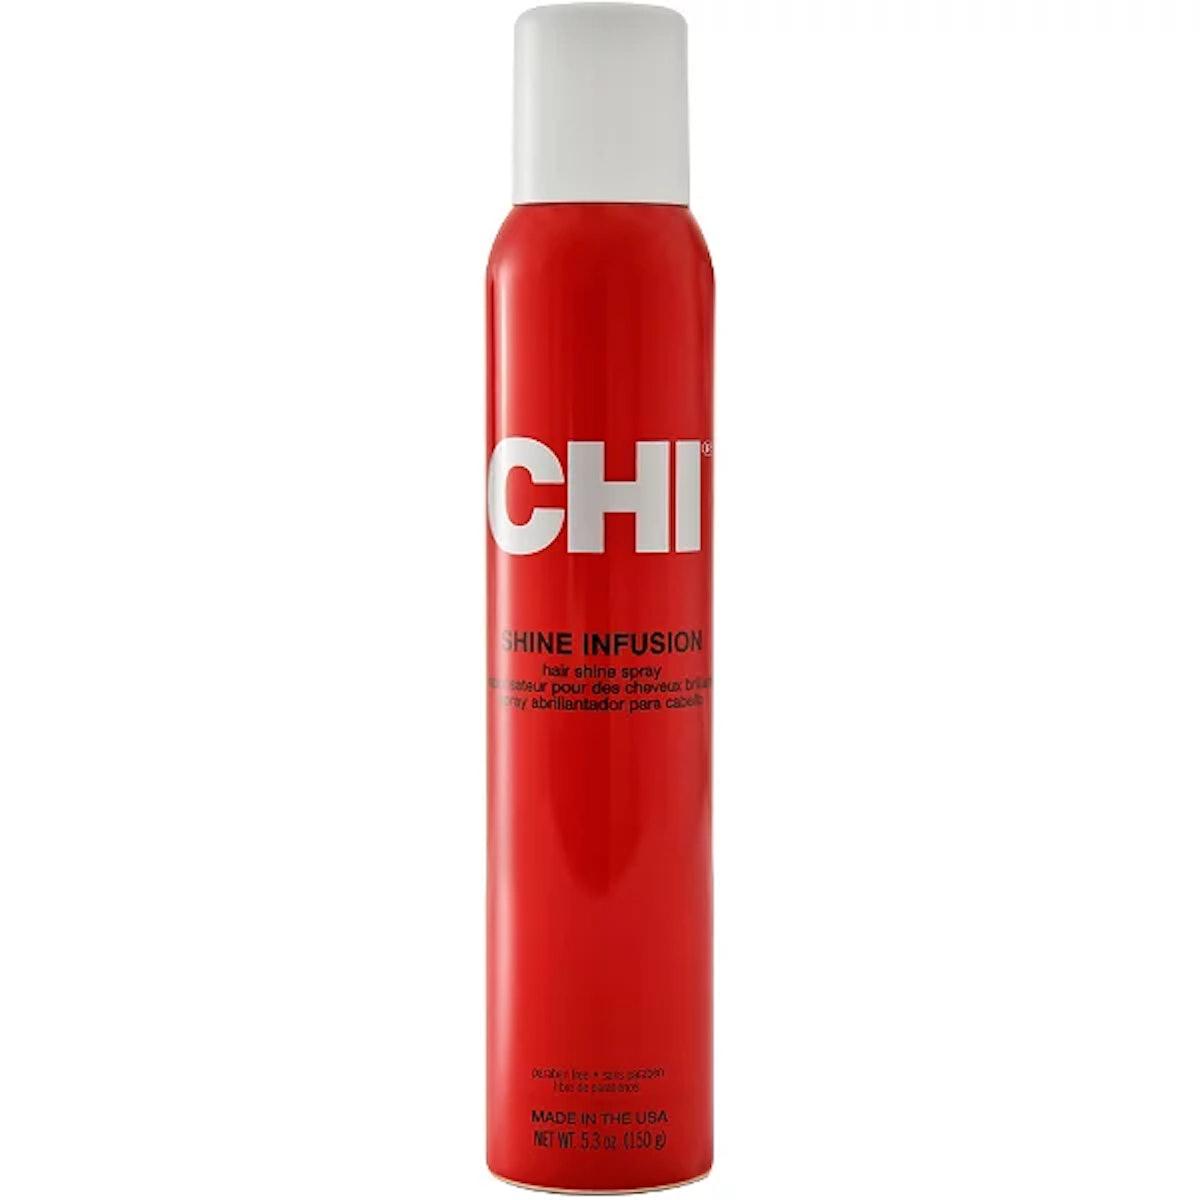 Chi Shine Infusion Hair Shine Spray